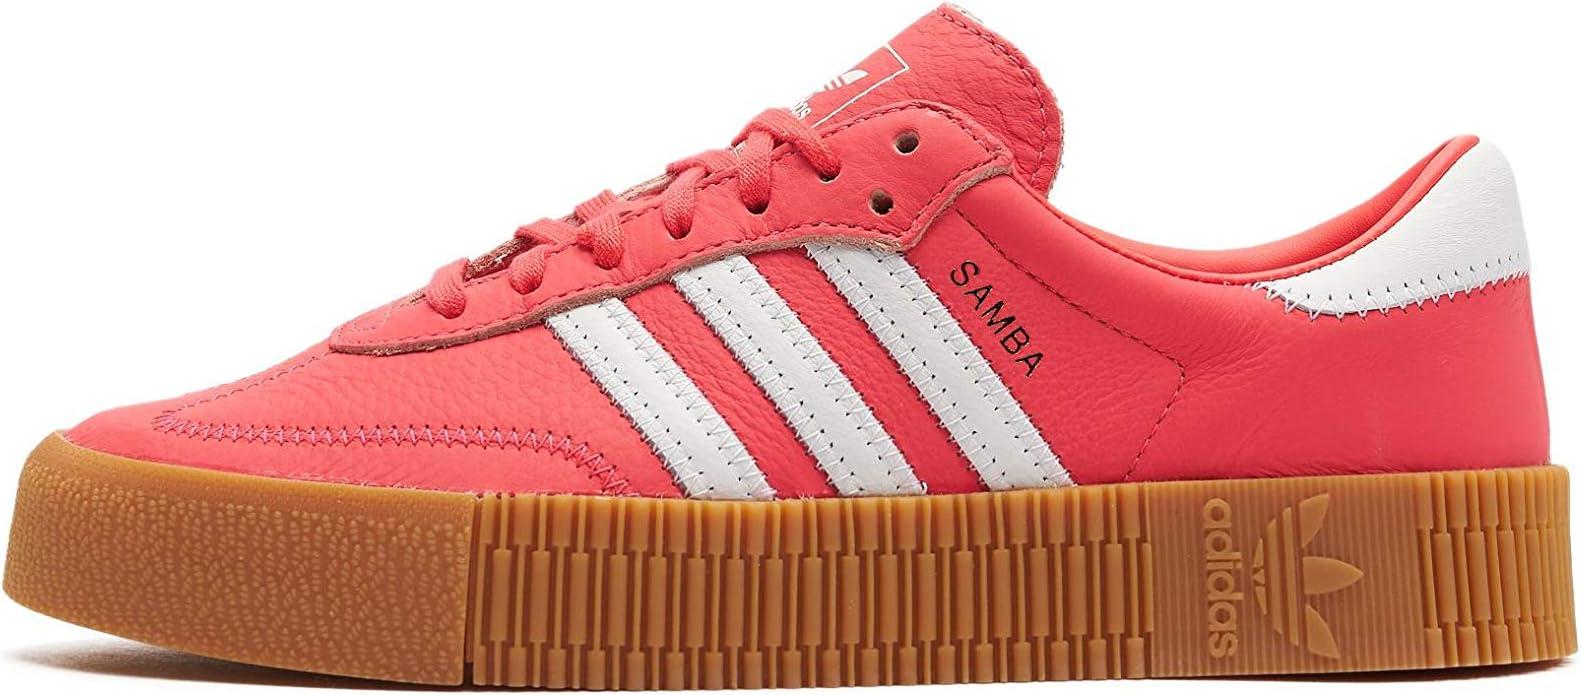 Chaussures Femme Adidas Sambarose: : Chaussures et Sacs